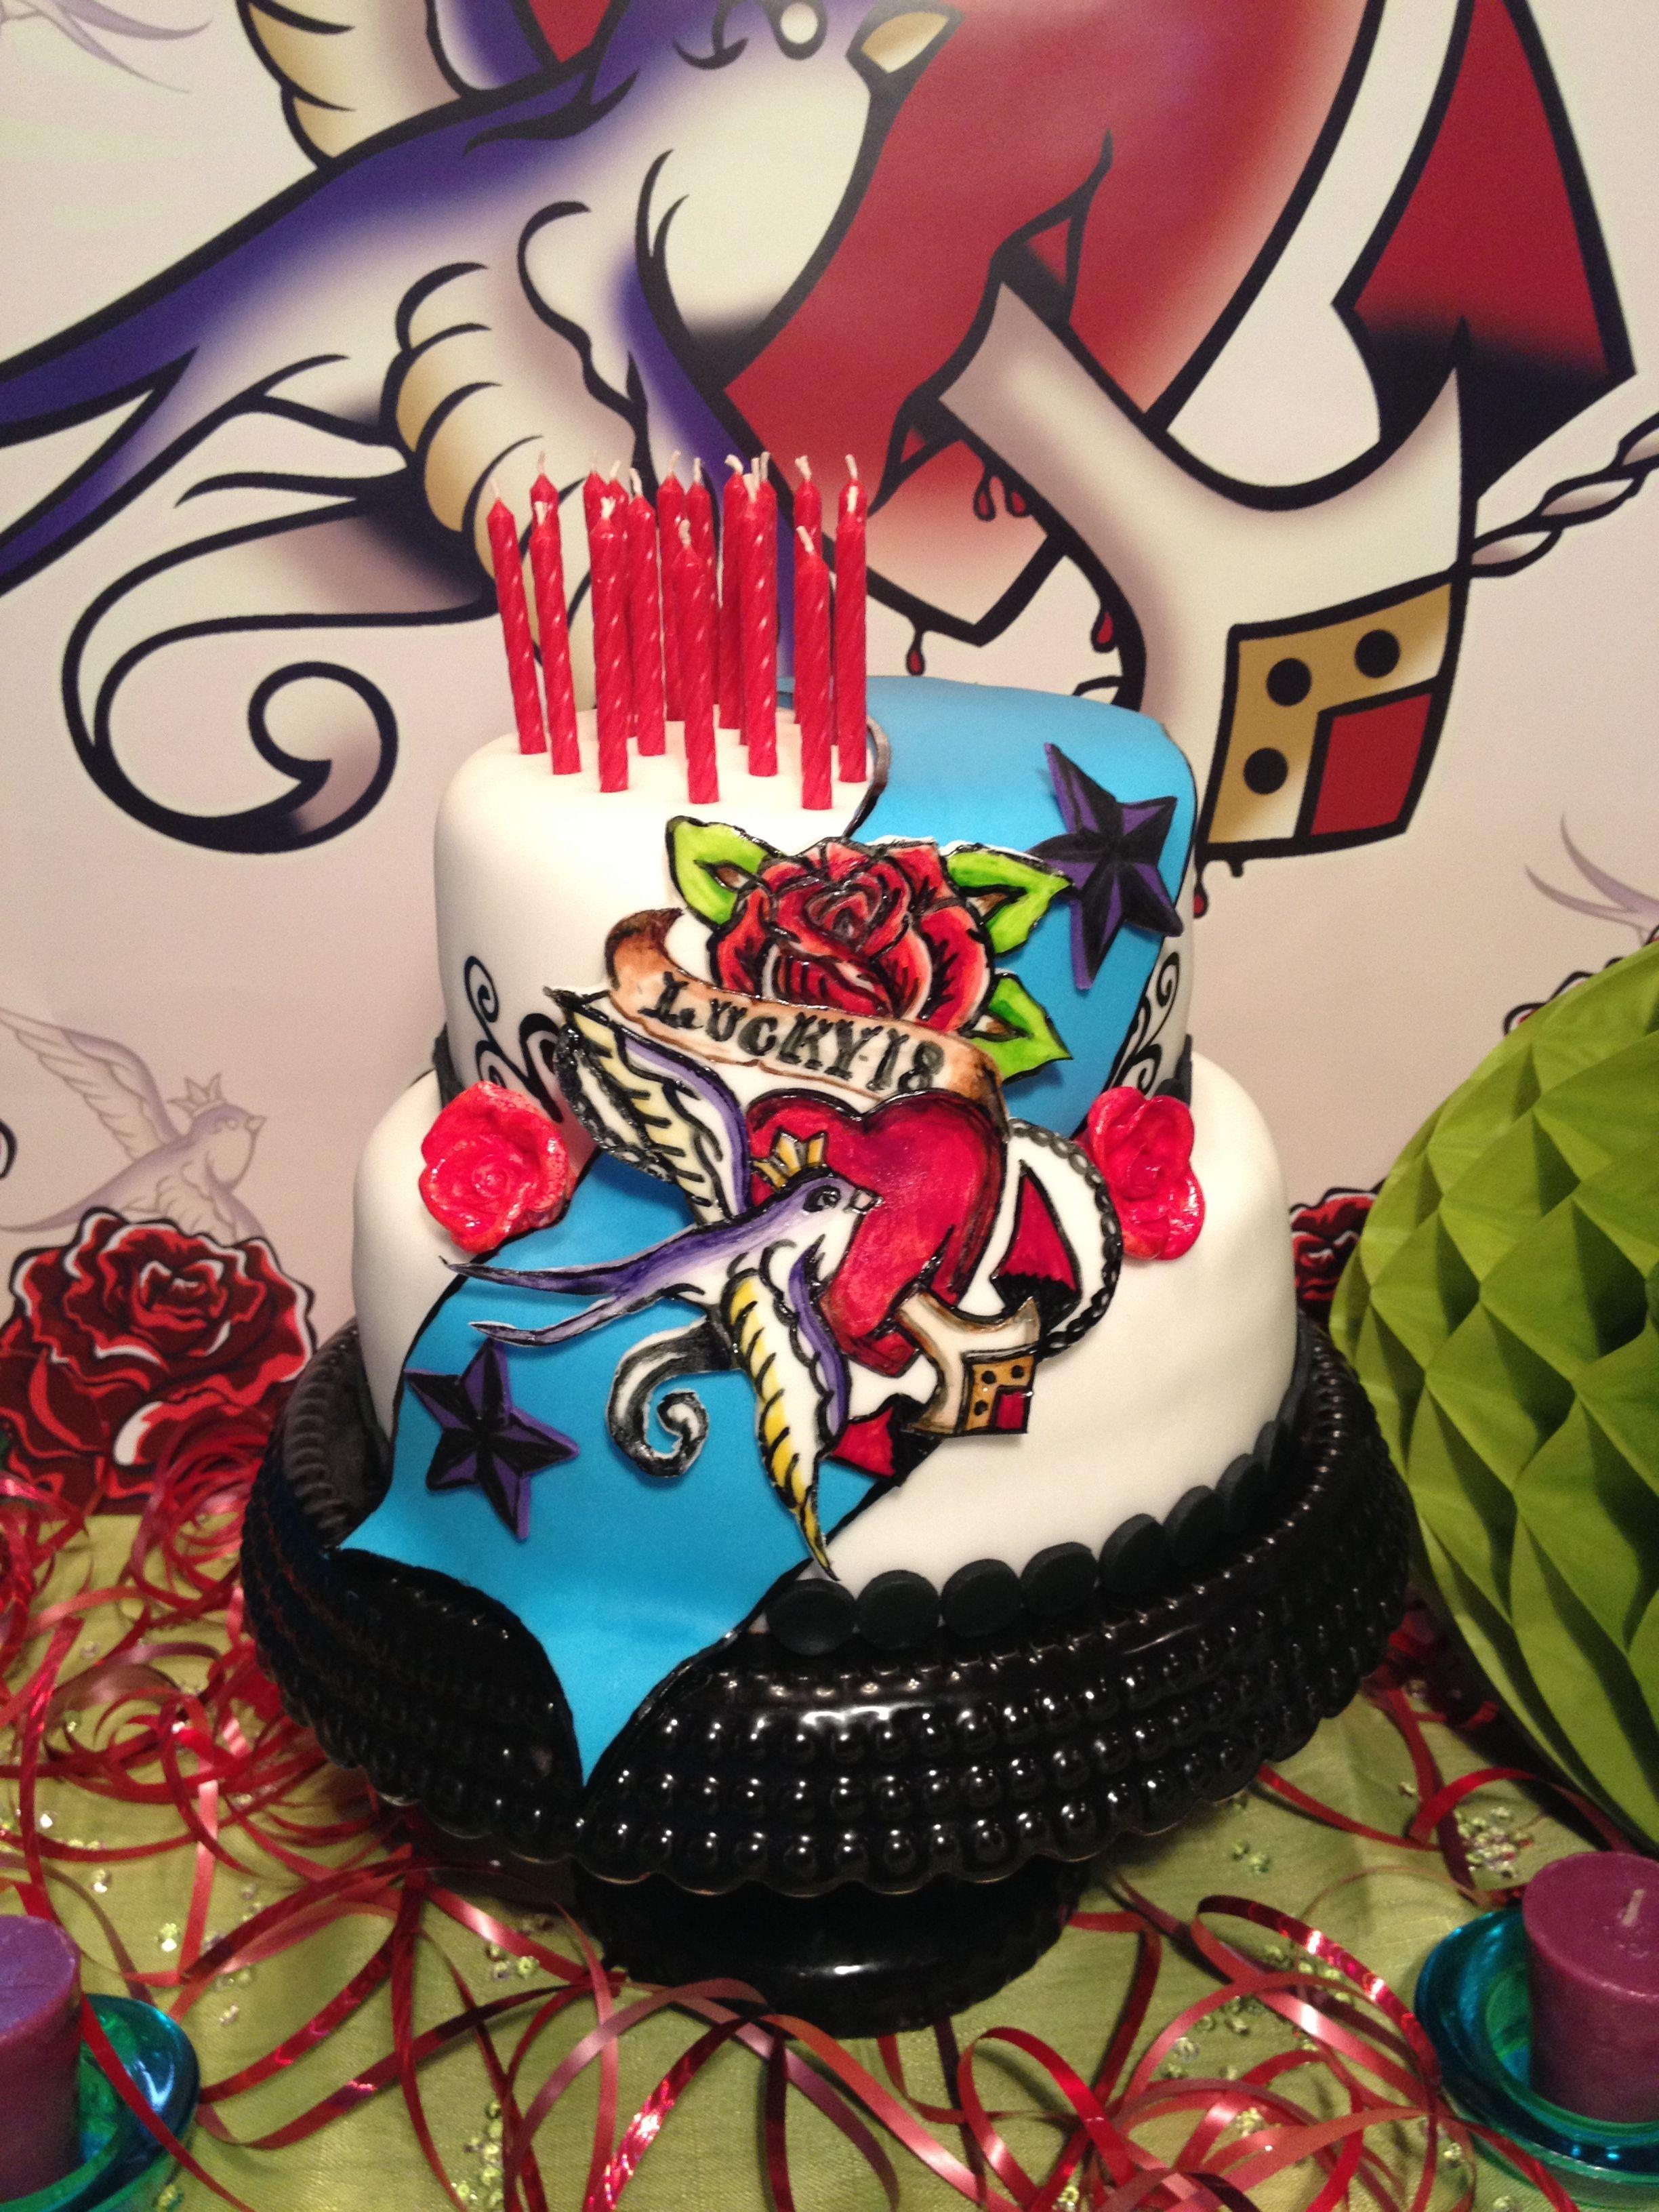 Tattoo Birthday Cake by T.Hawkins